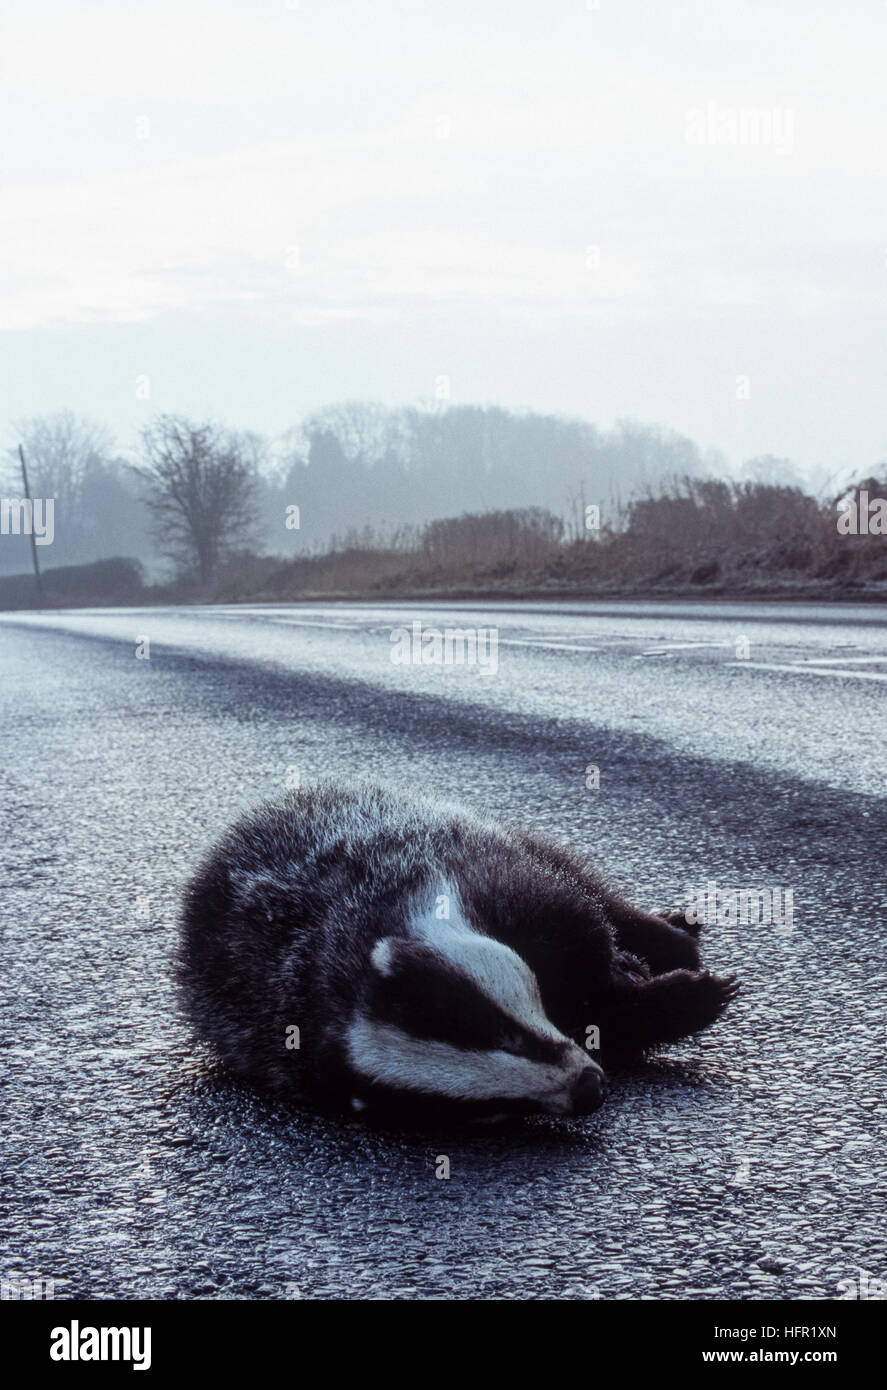 Eurasian Badger, (Meles meles), killed on road, Hertfordshire, England, United Kingdom - Stock Image